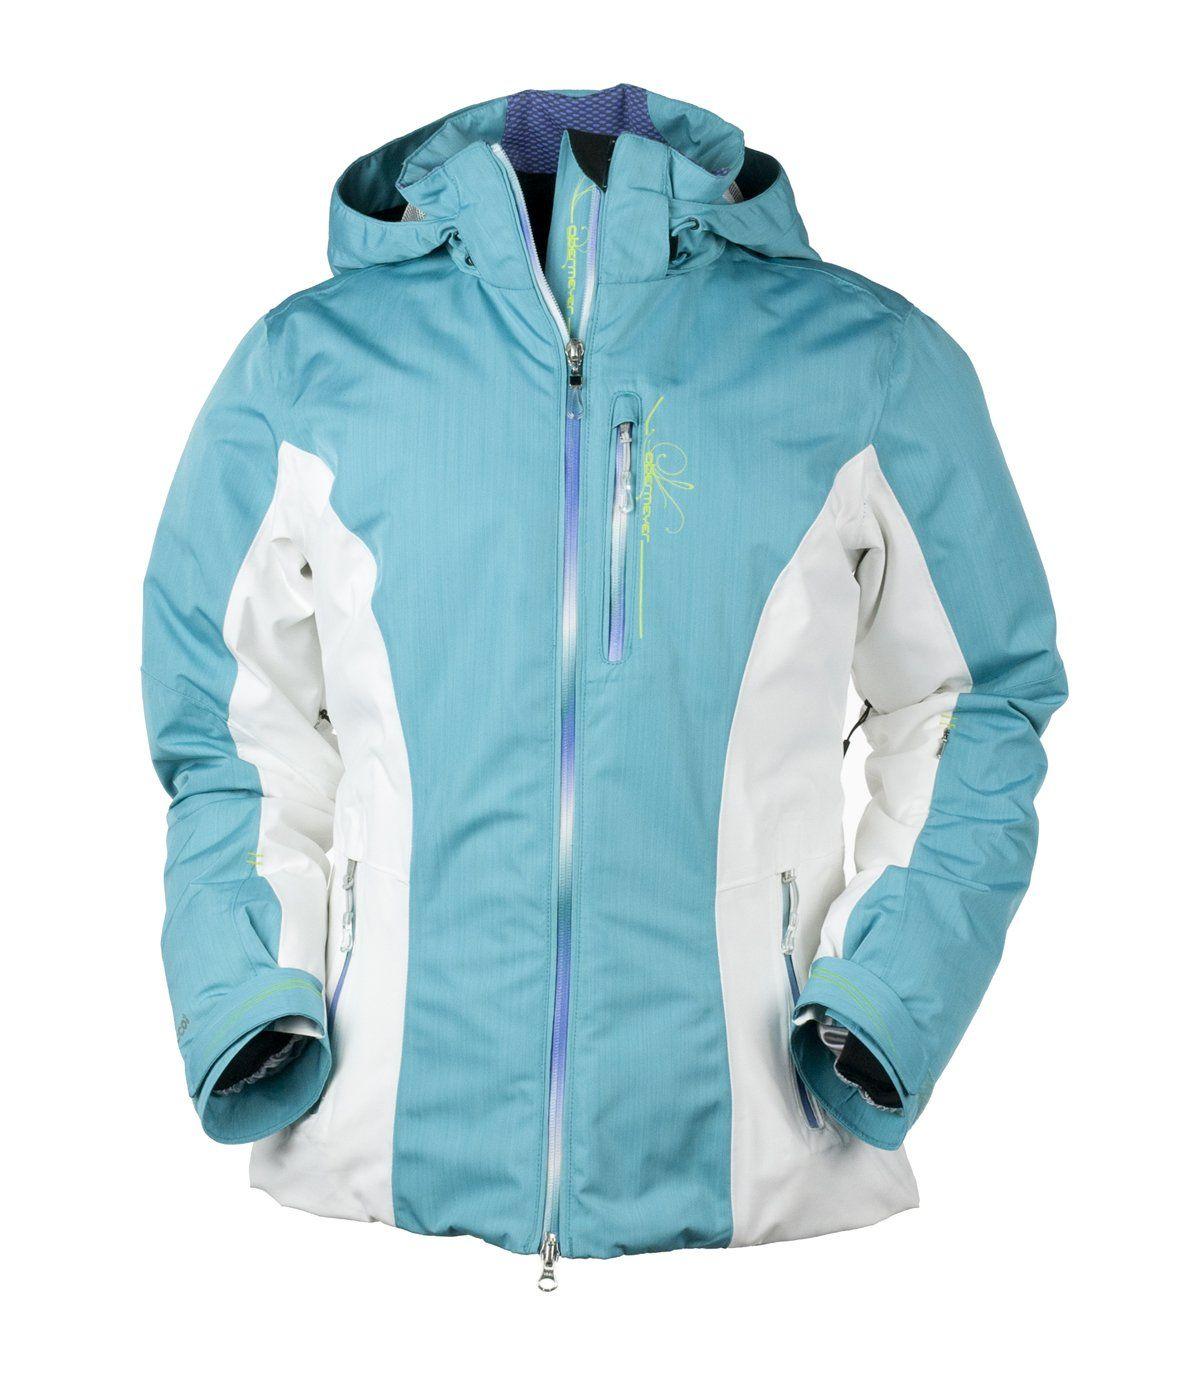 Cordillera Jacket - Women - Obermeyer Ski Clothing